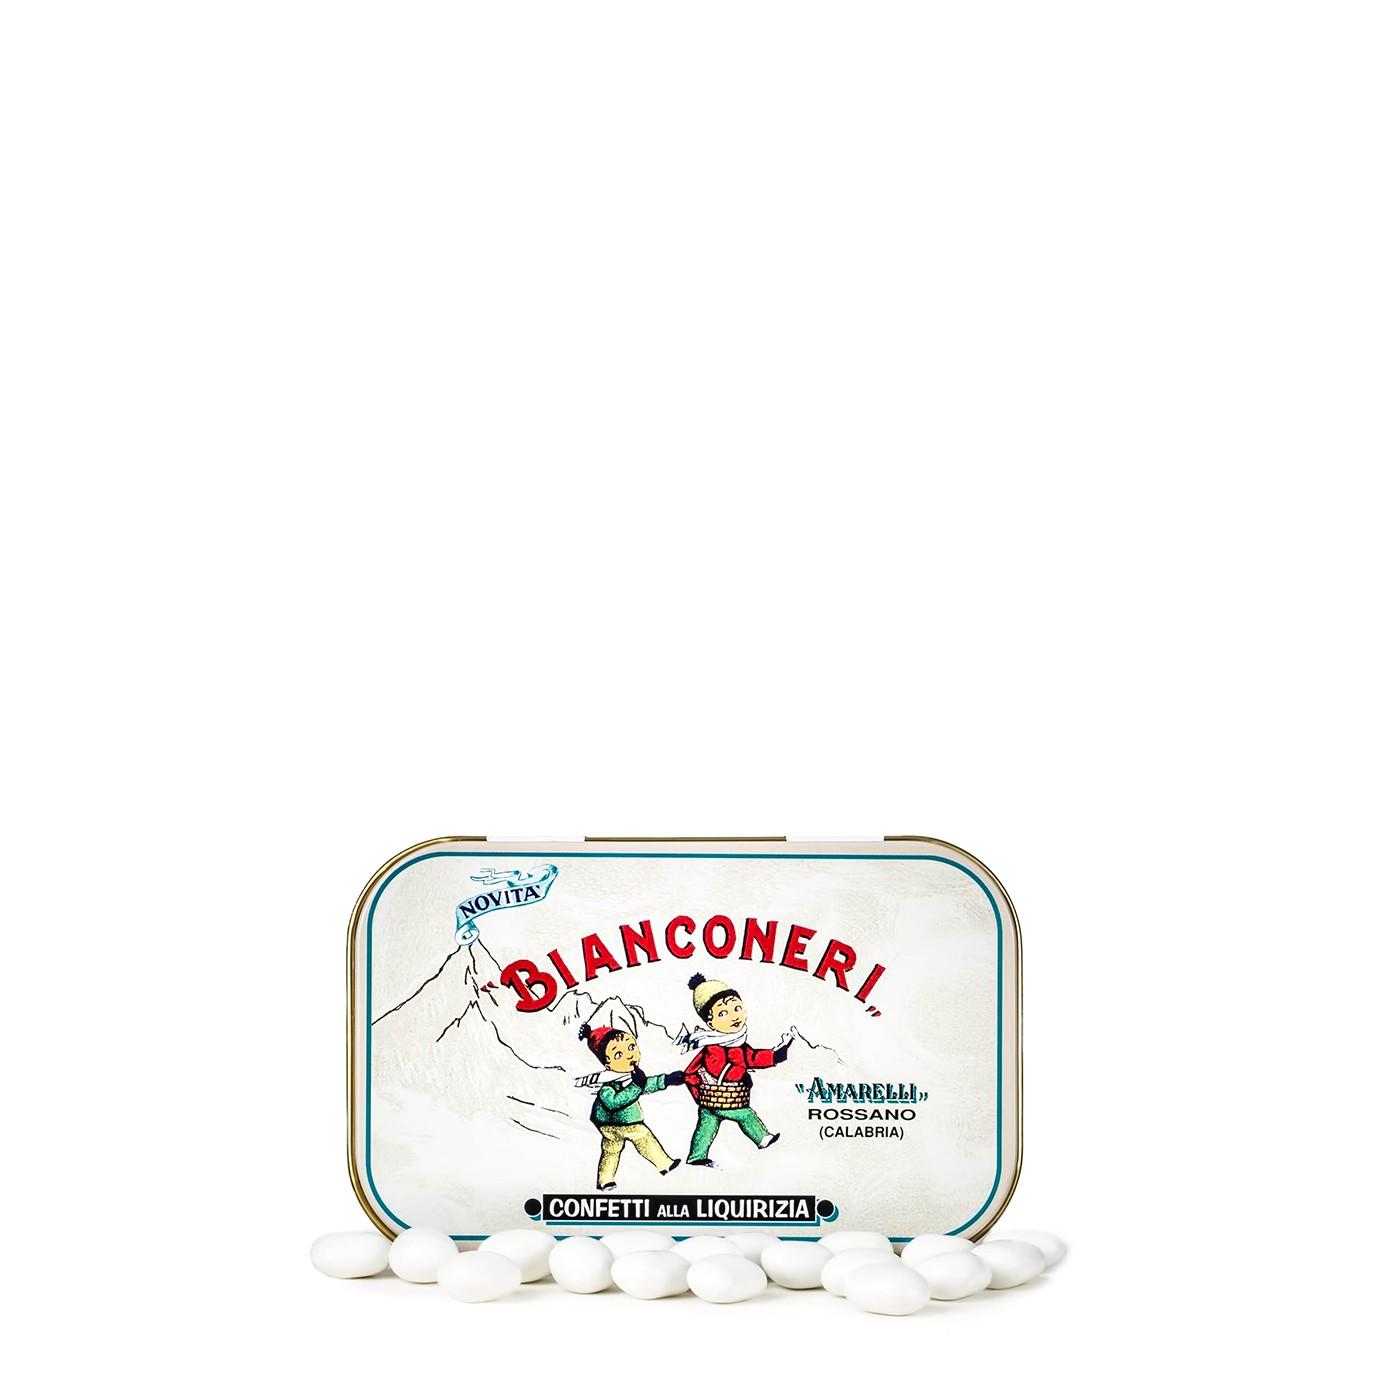 Bianconeri Mint Liquorice 1.8 oz